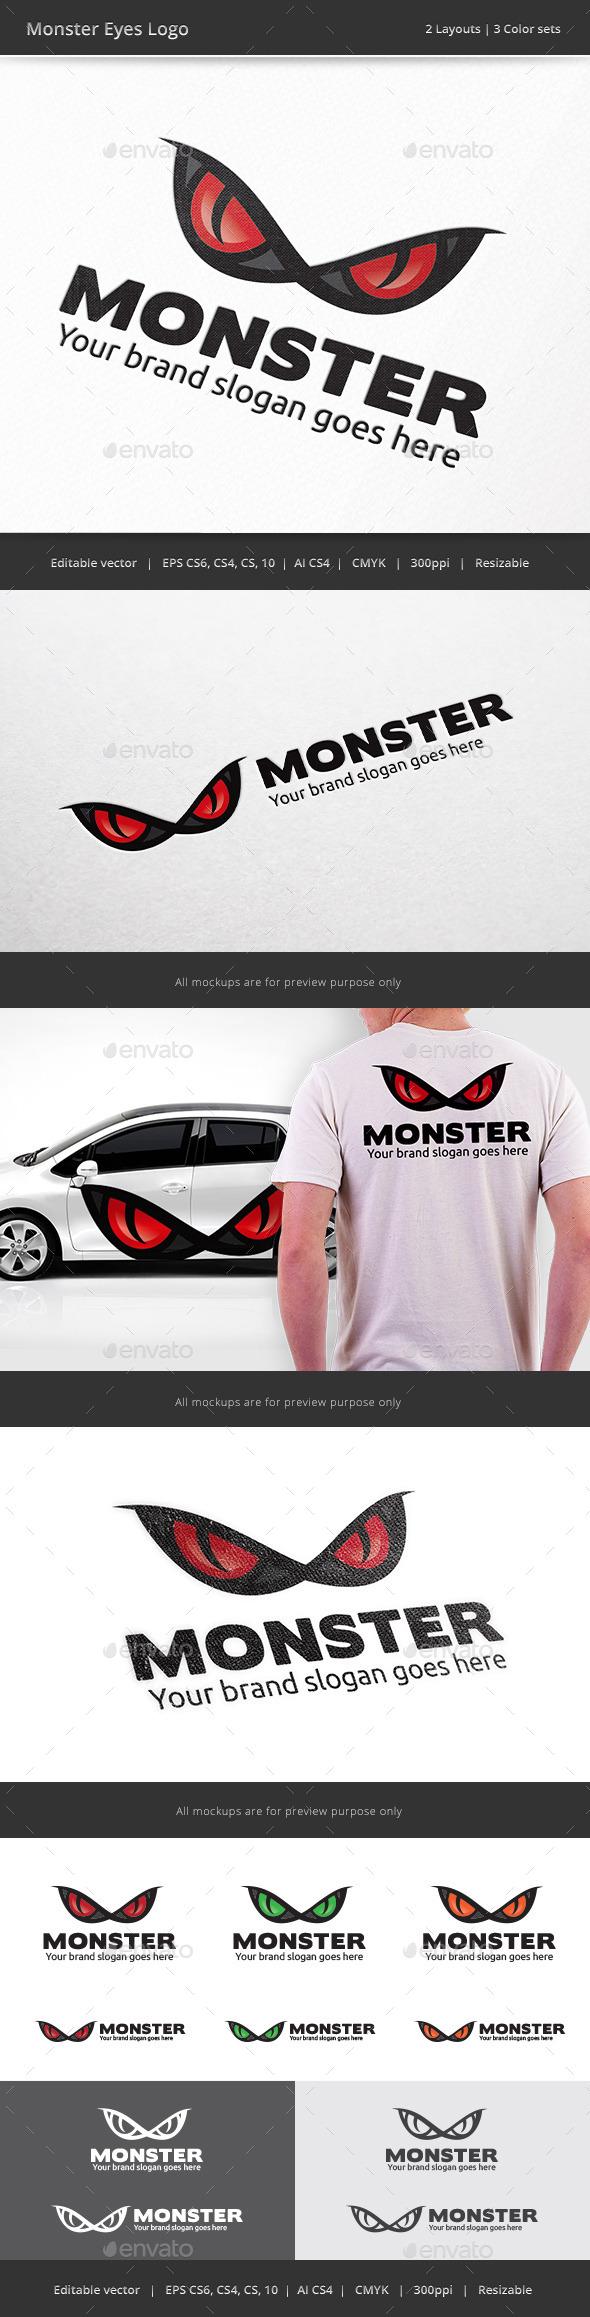 GraphicRiver Monster Eyes Logo 8889522